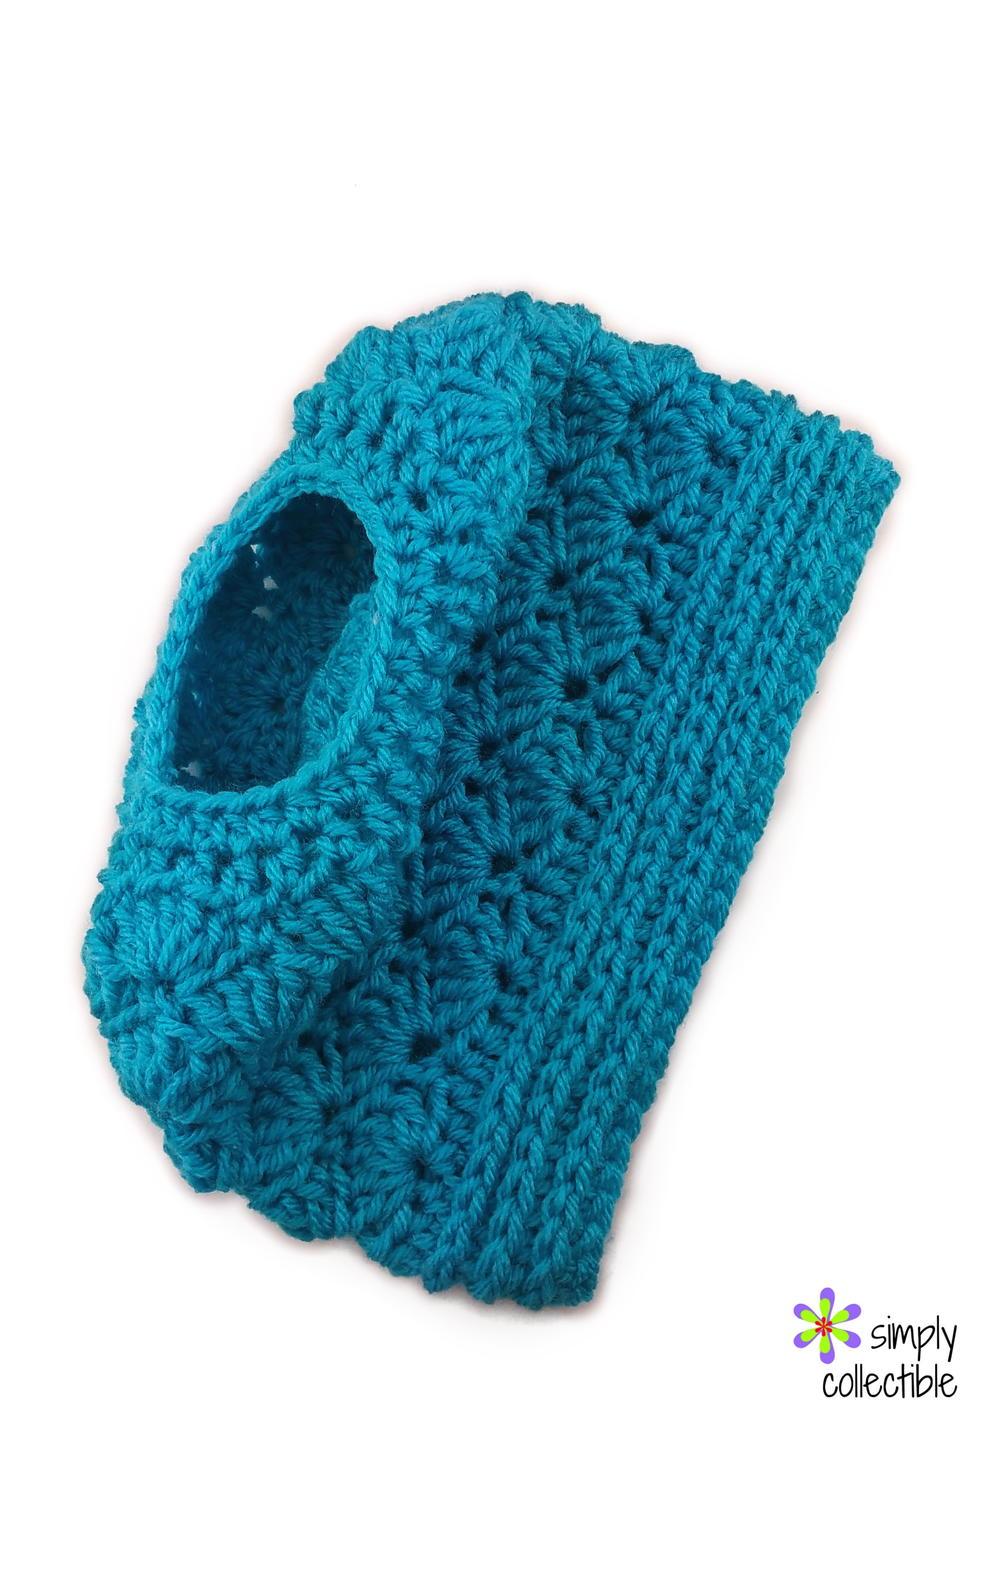 48 Free Crochet Hat Patterns | FaveCrafts.com